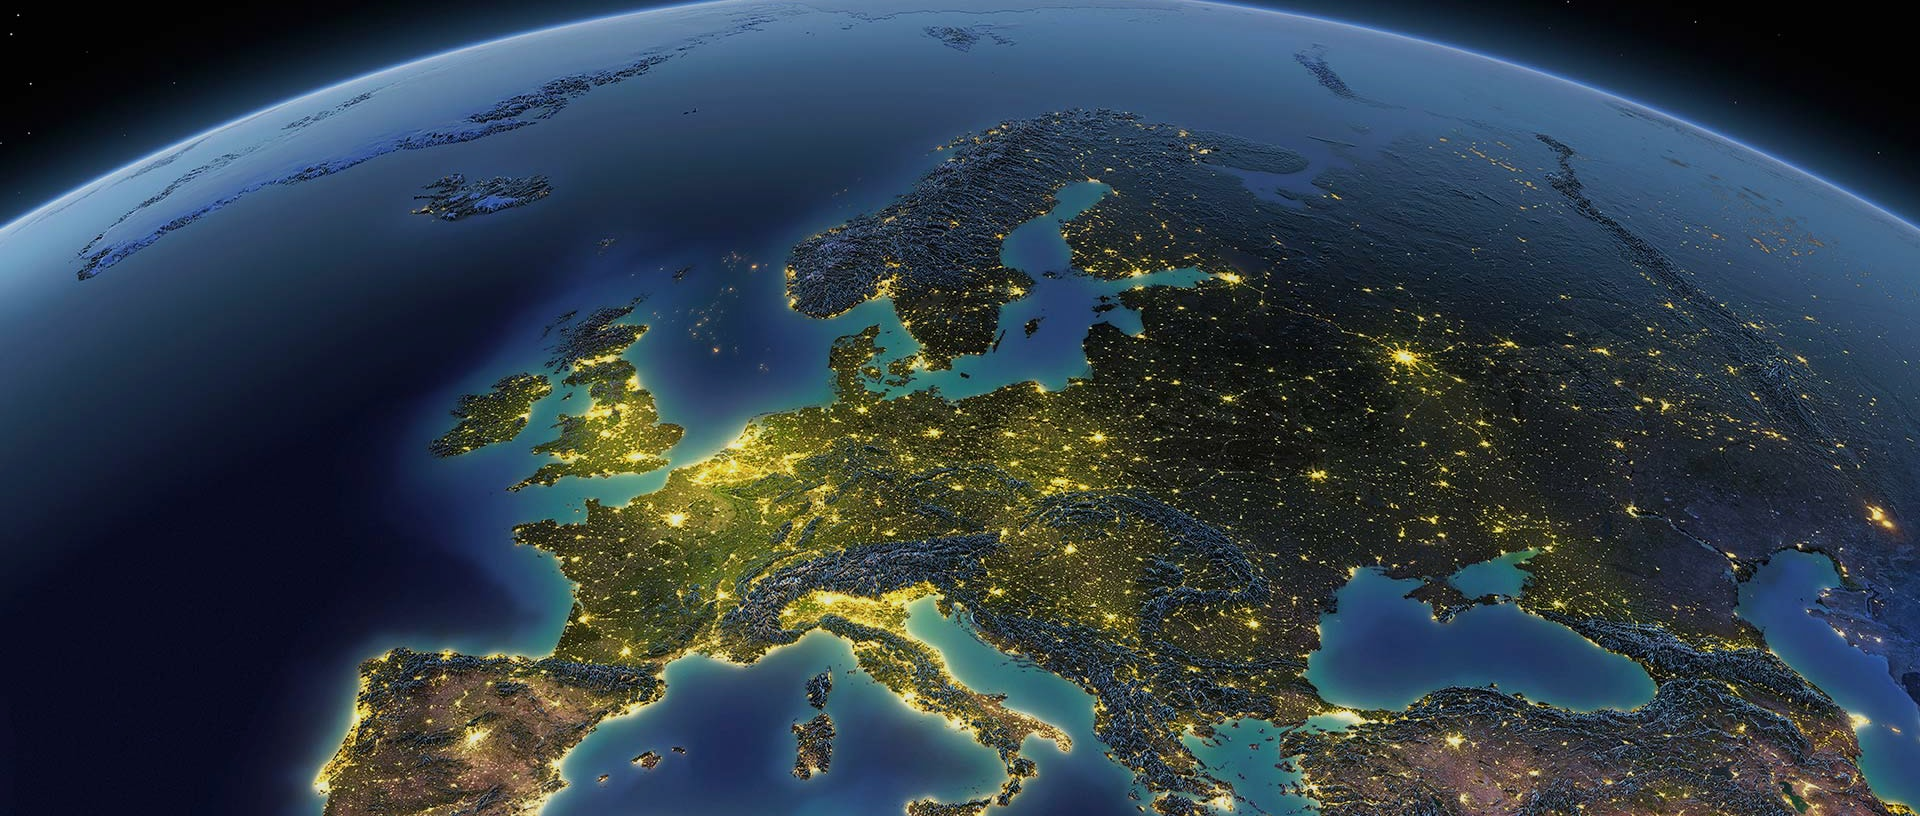 Вид на жительство в Европе-inlegal.eu